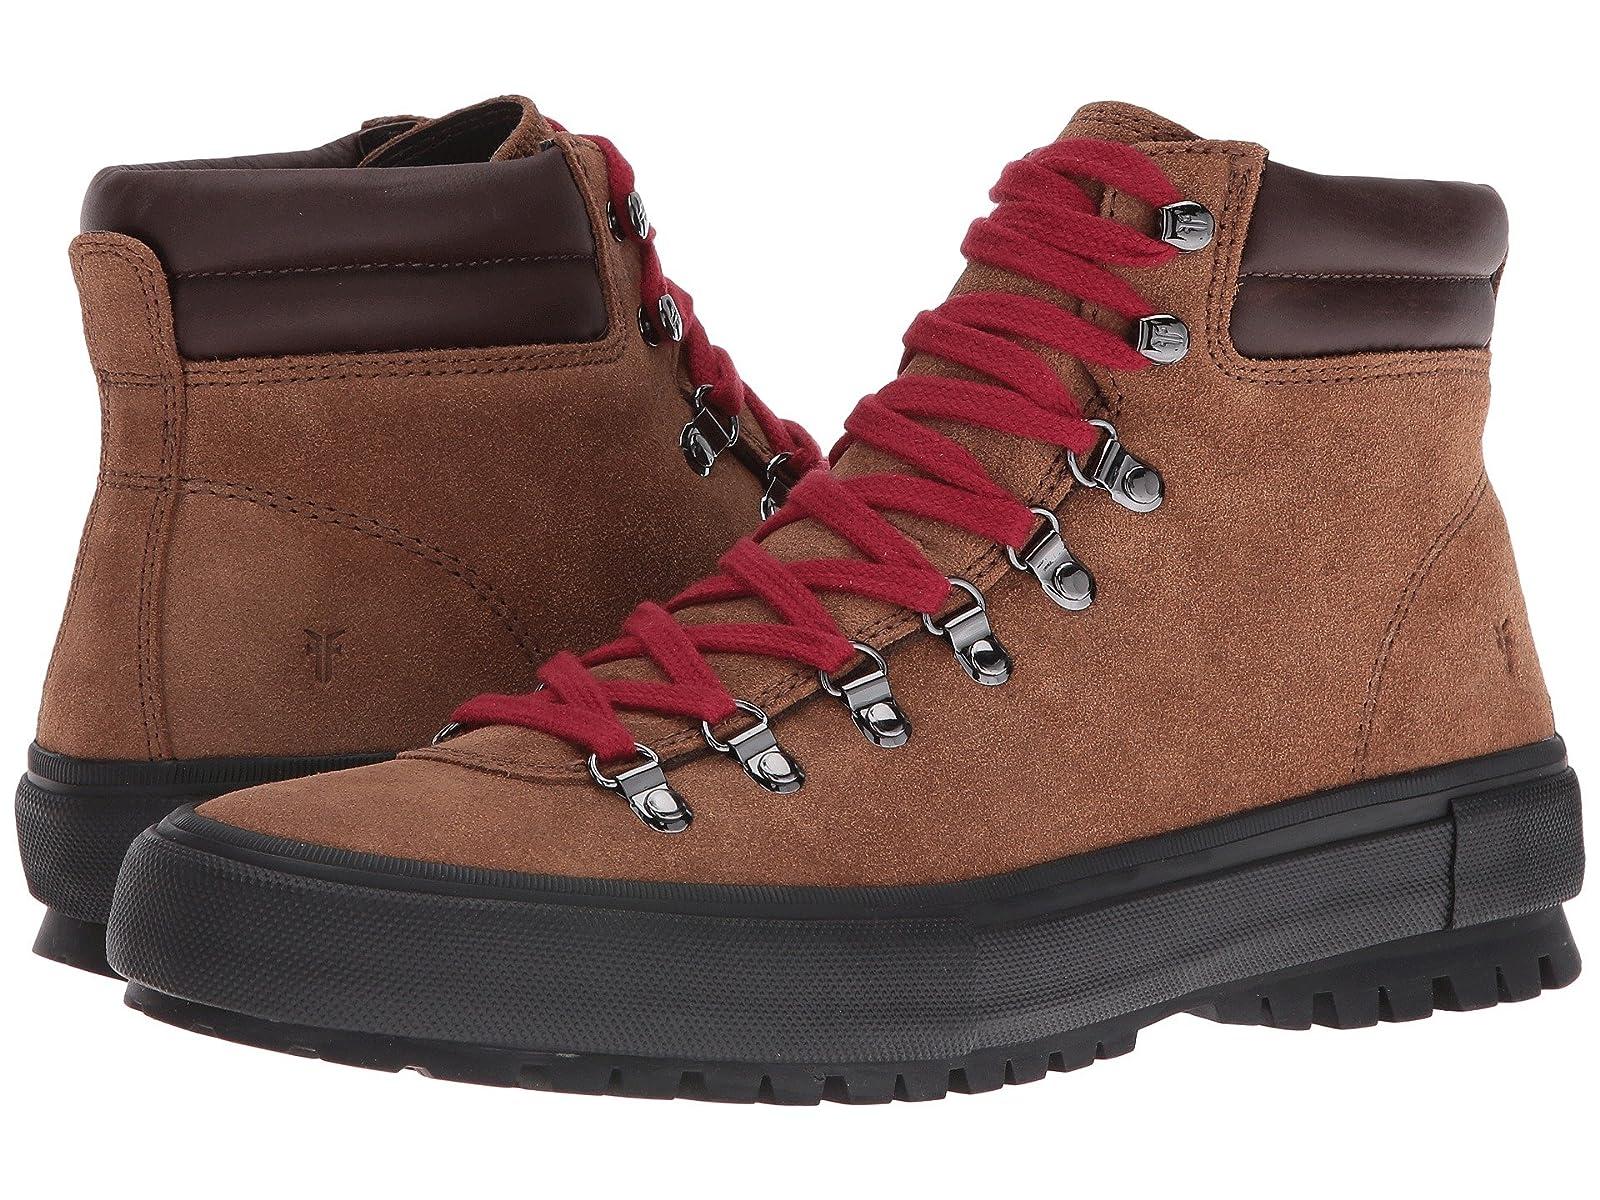 Frye Ryan Lug HikerCheap and distinctive eye-catching shoes